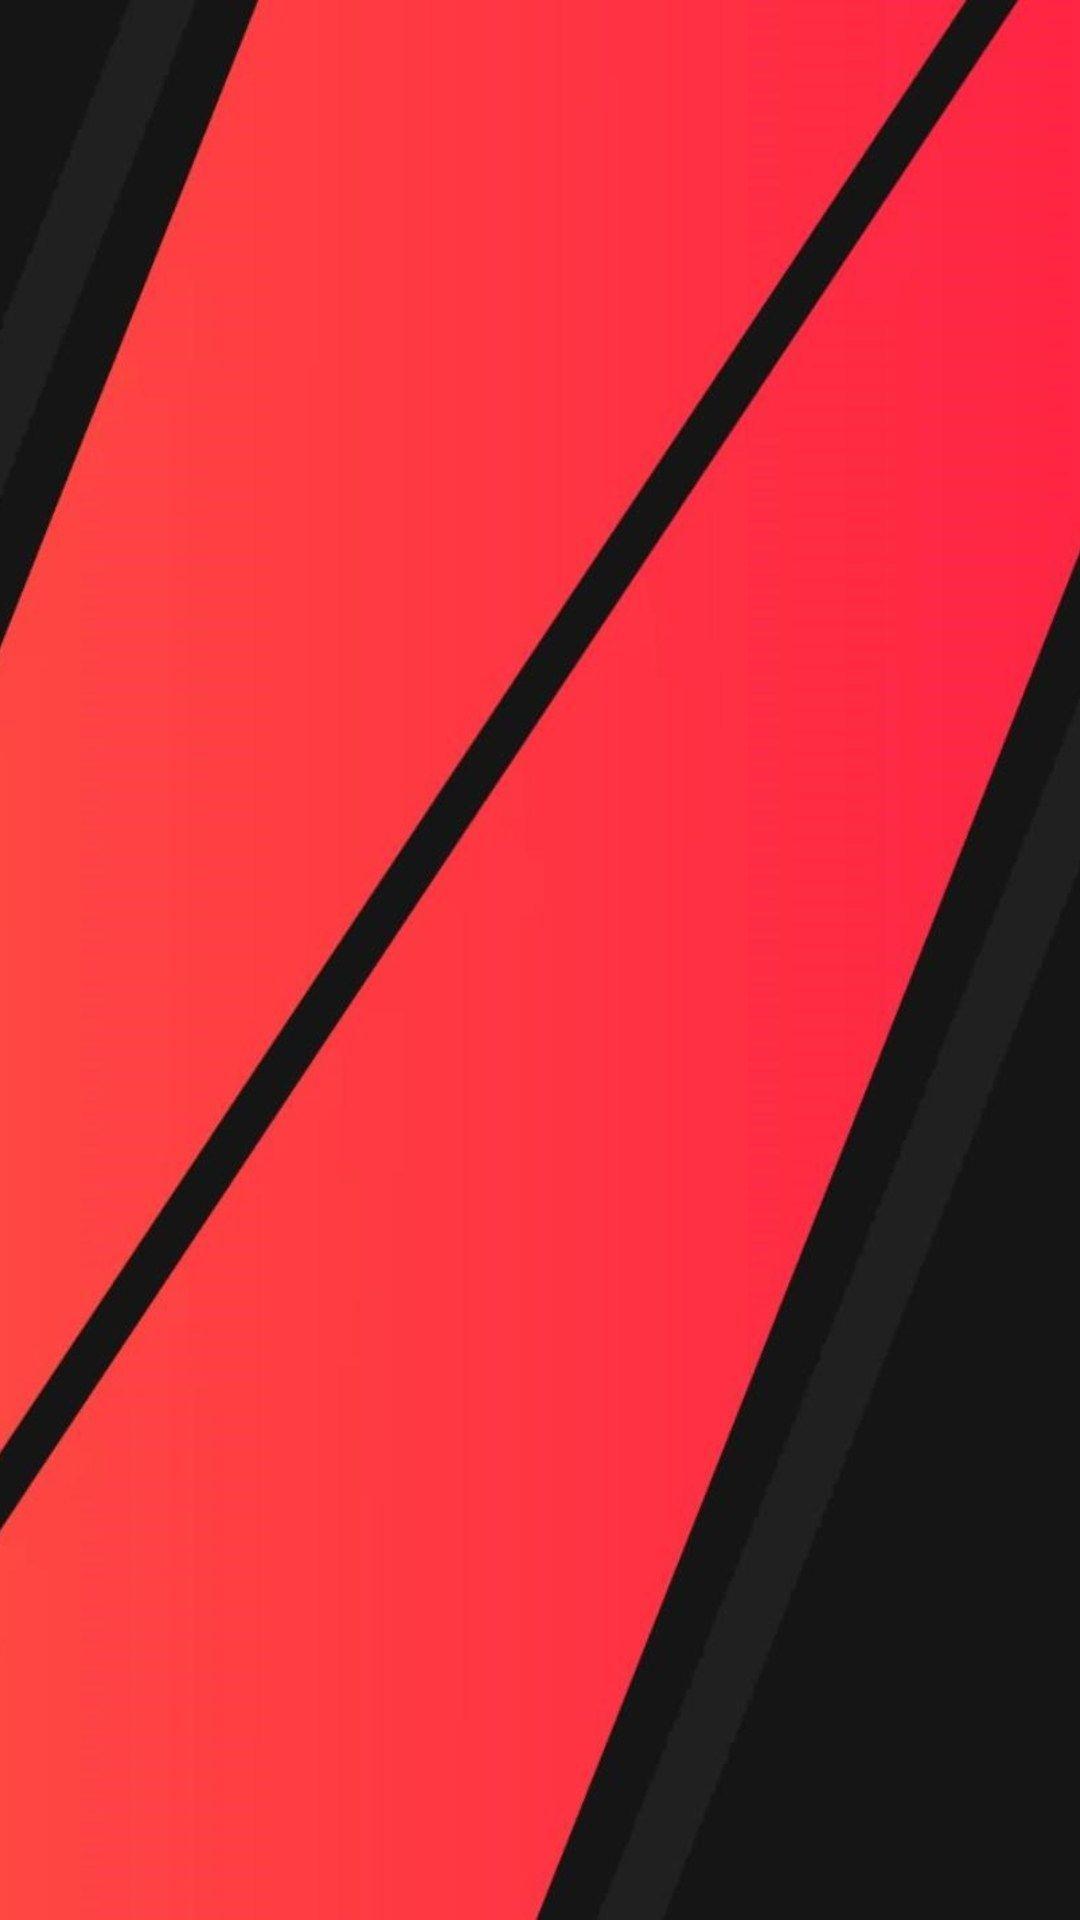 Black Red iPhone hd wallpaper